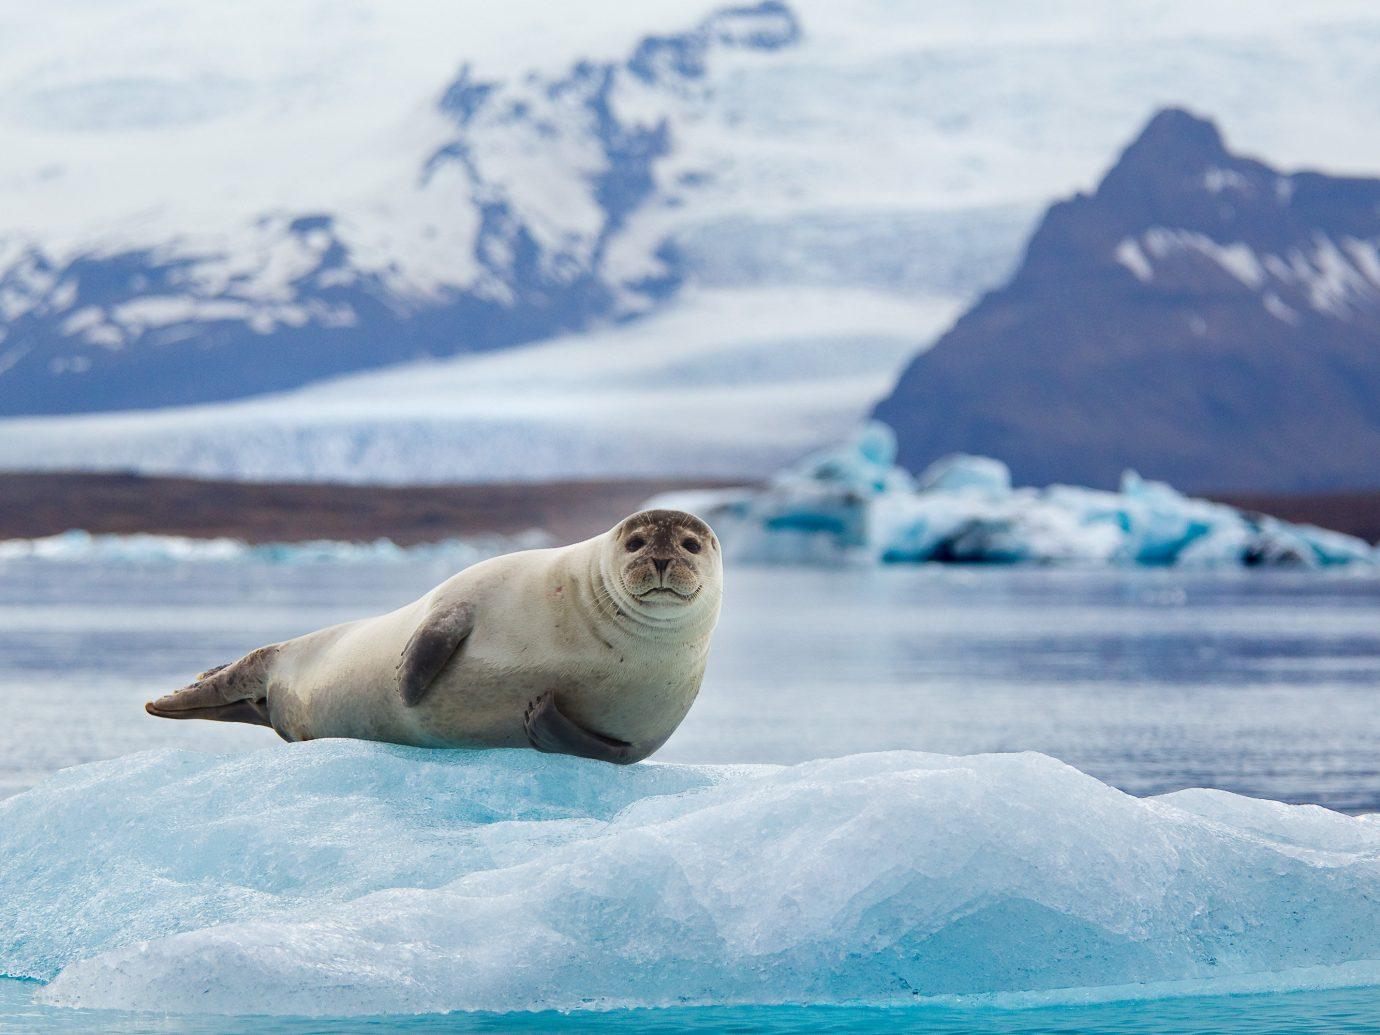 Iceland Outdoors + Adventure Road Trips arctic ocean arctic polar ice cap polar bear ice cap Sea ice iceberg glacial landform sea ice Wildlife Ocean glacier melting seals sky